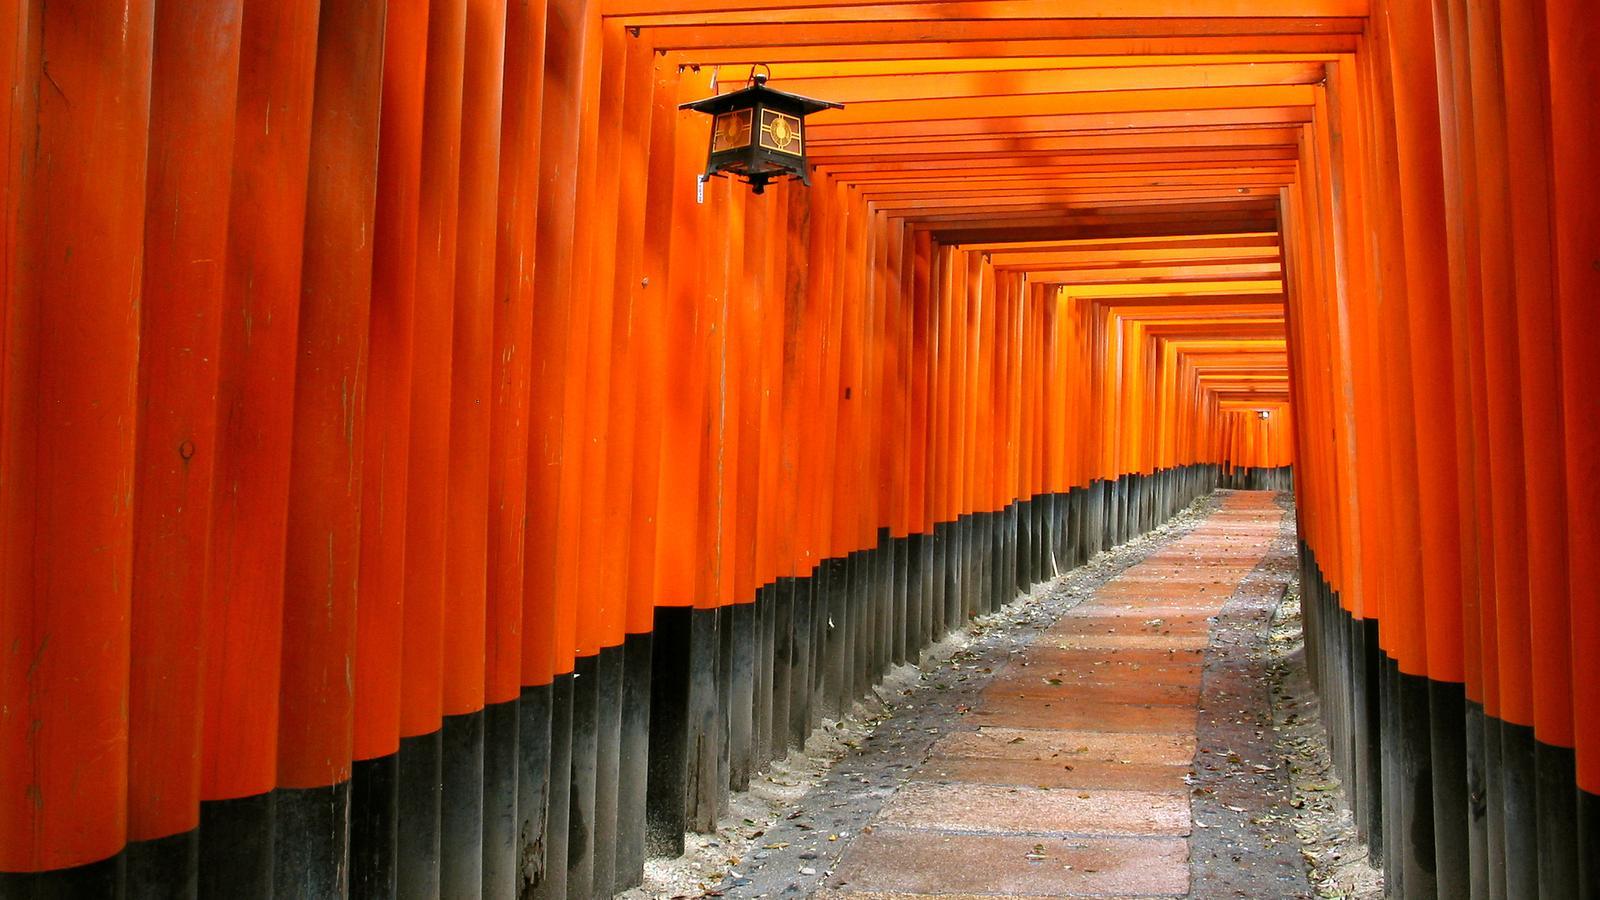 Japan Erlebnisreise in der Gruppe traveljunkies